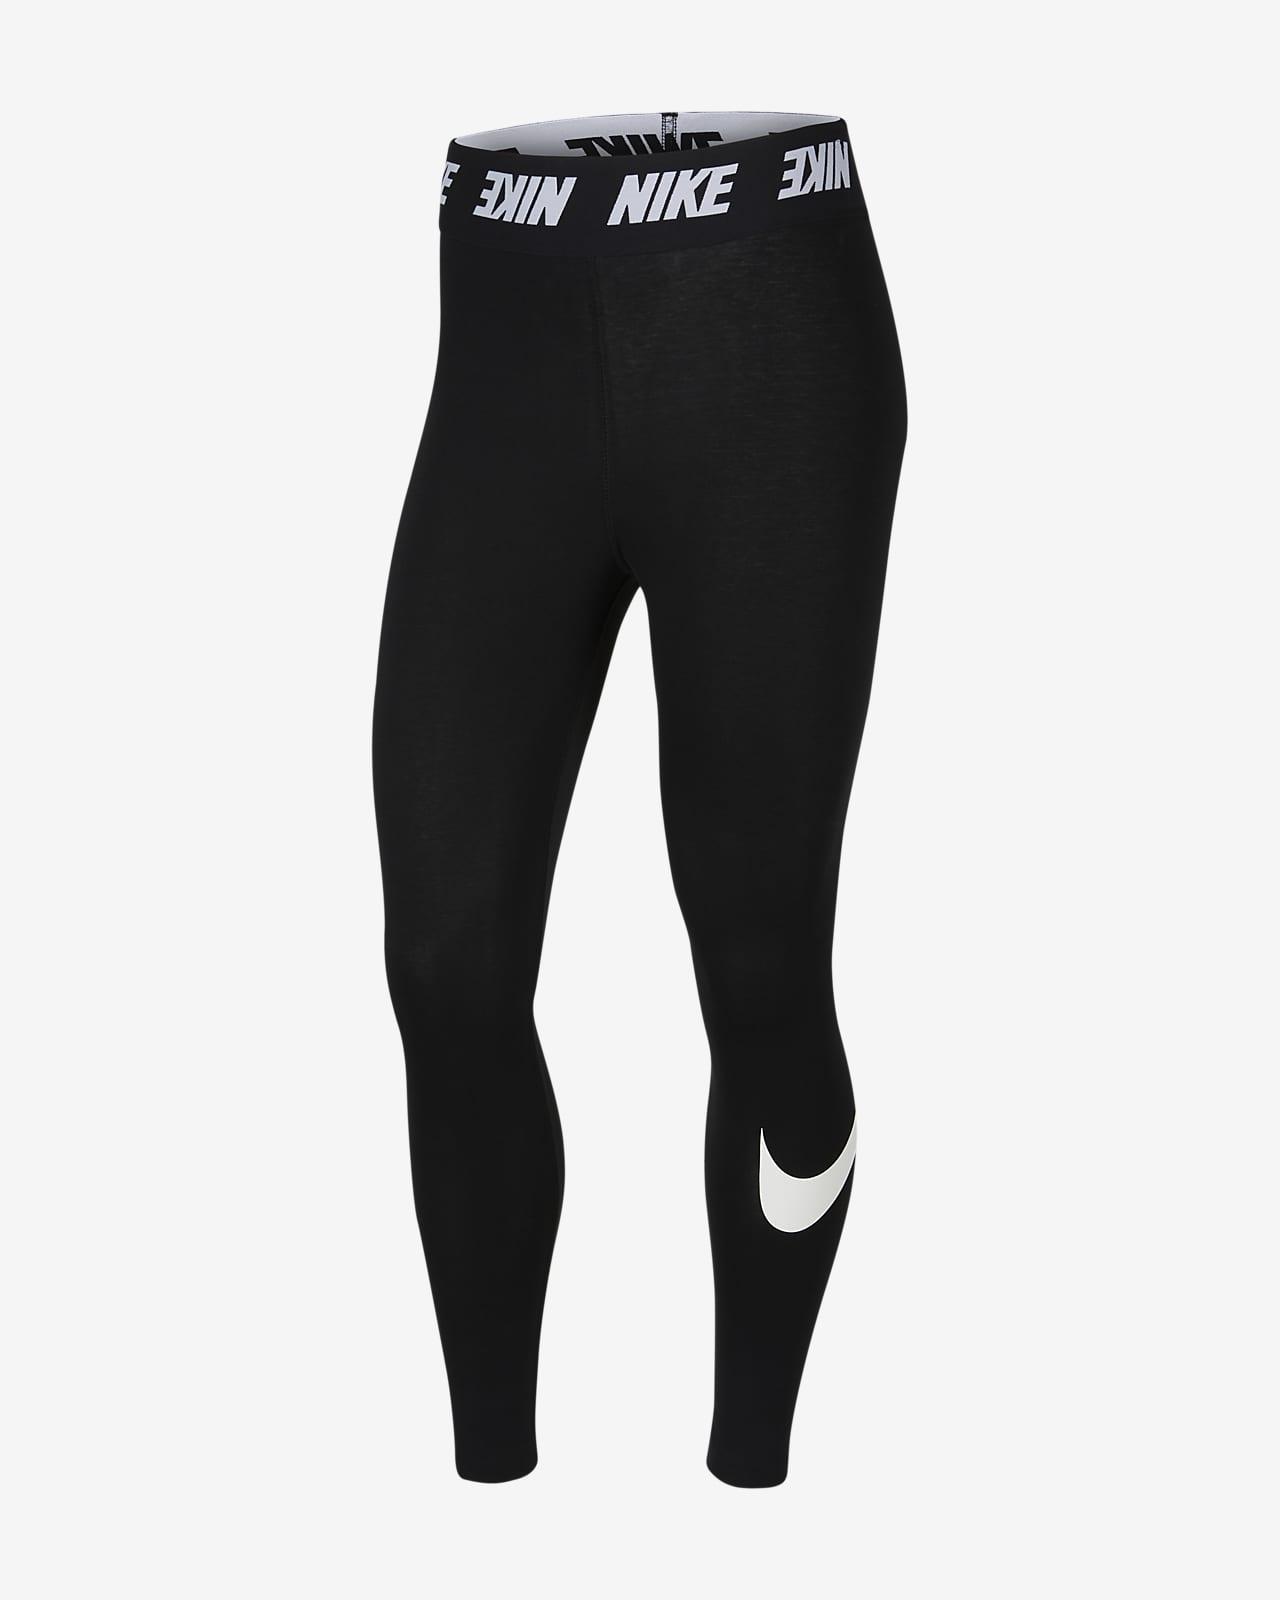 Nike Sportswear Club 女子高腰紧身裤